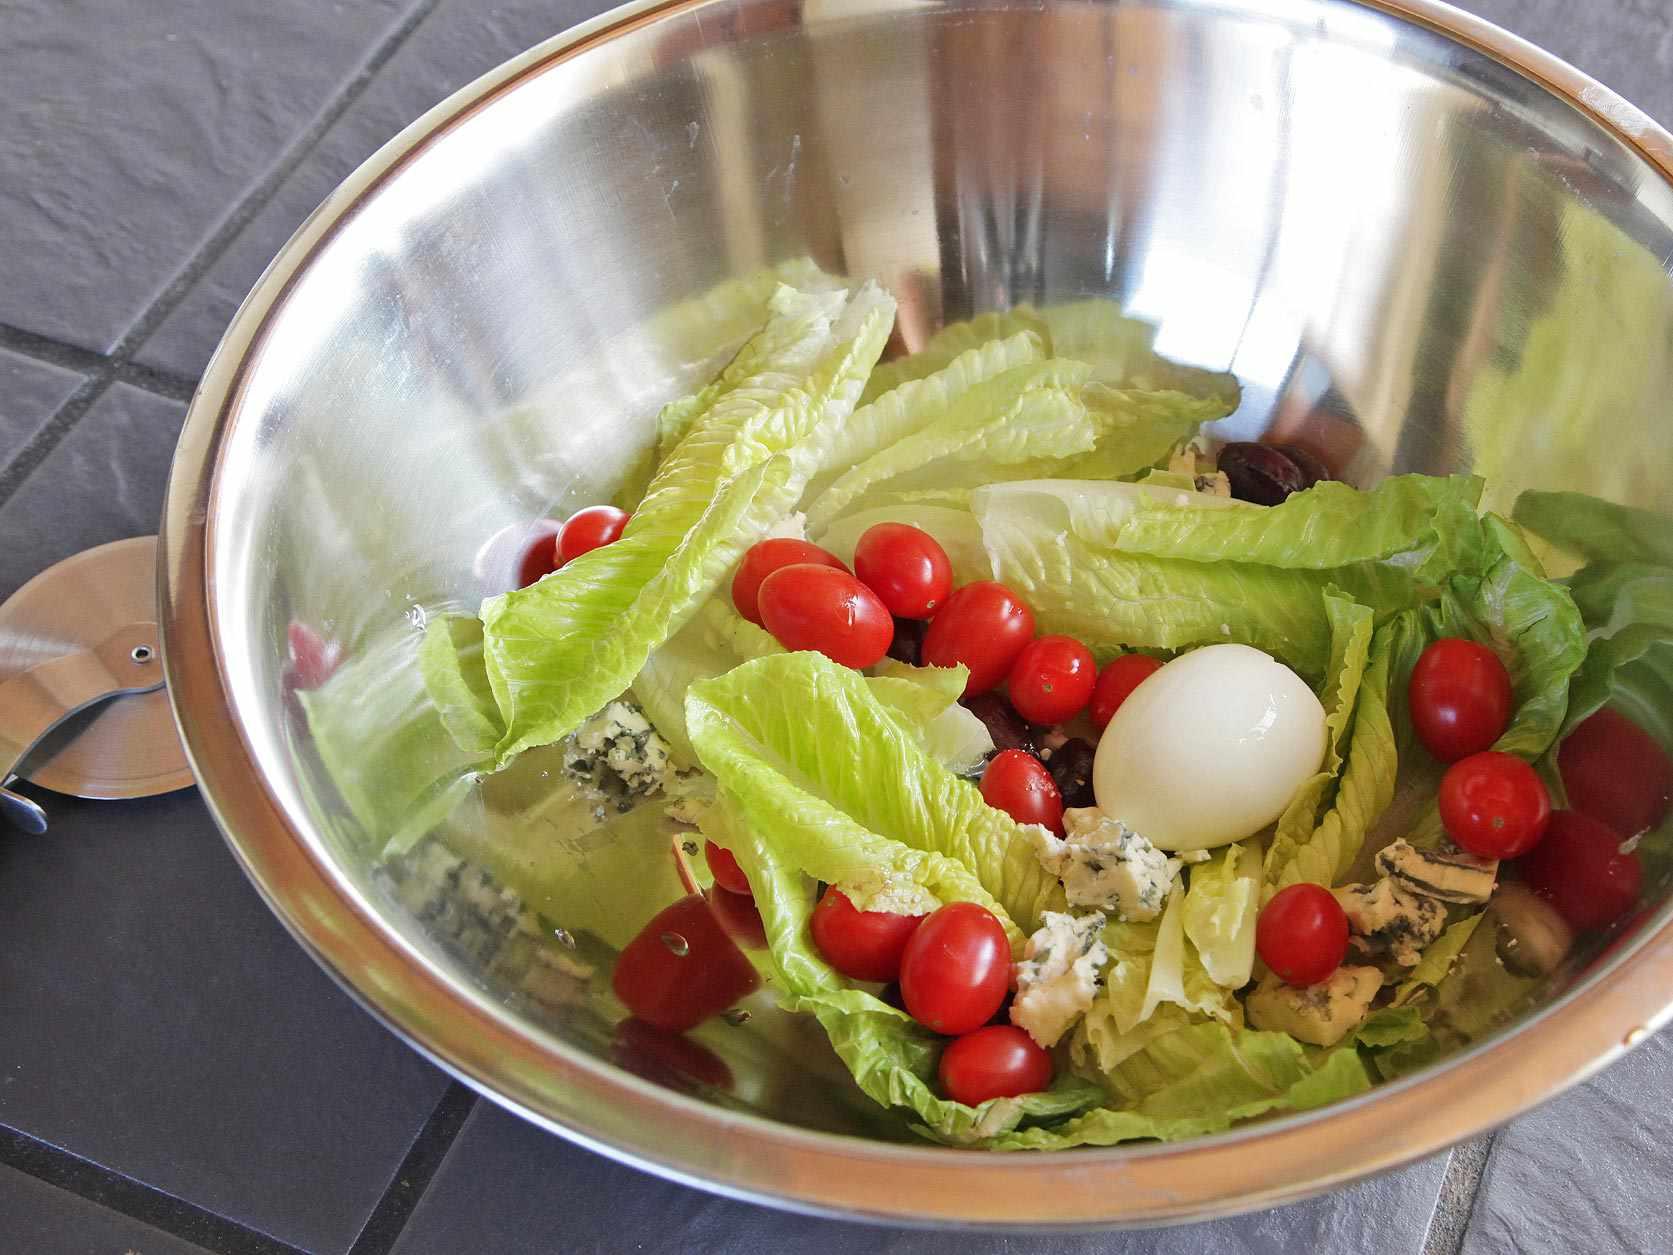 20140910-chopped-salad-pizza-wheel-1.jpg